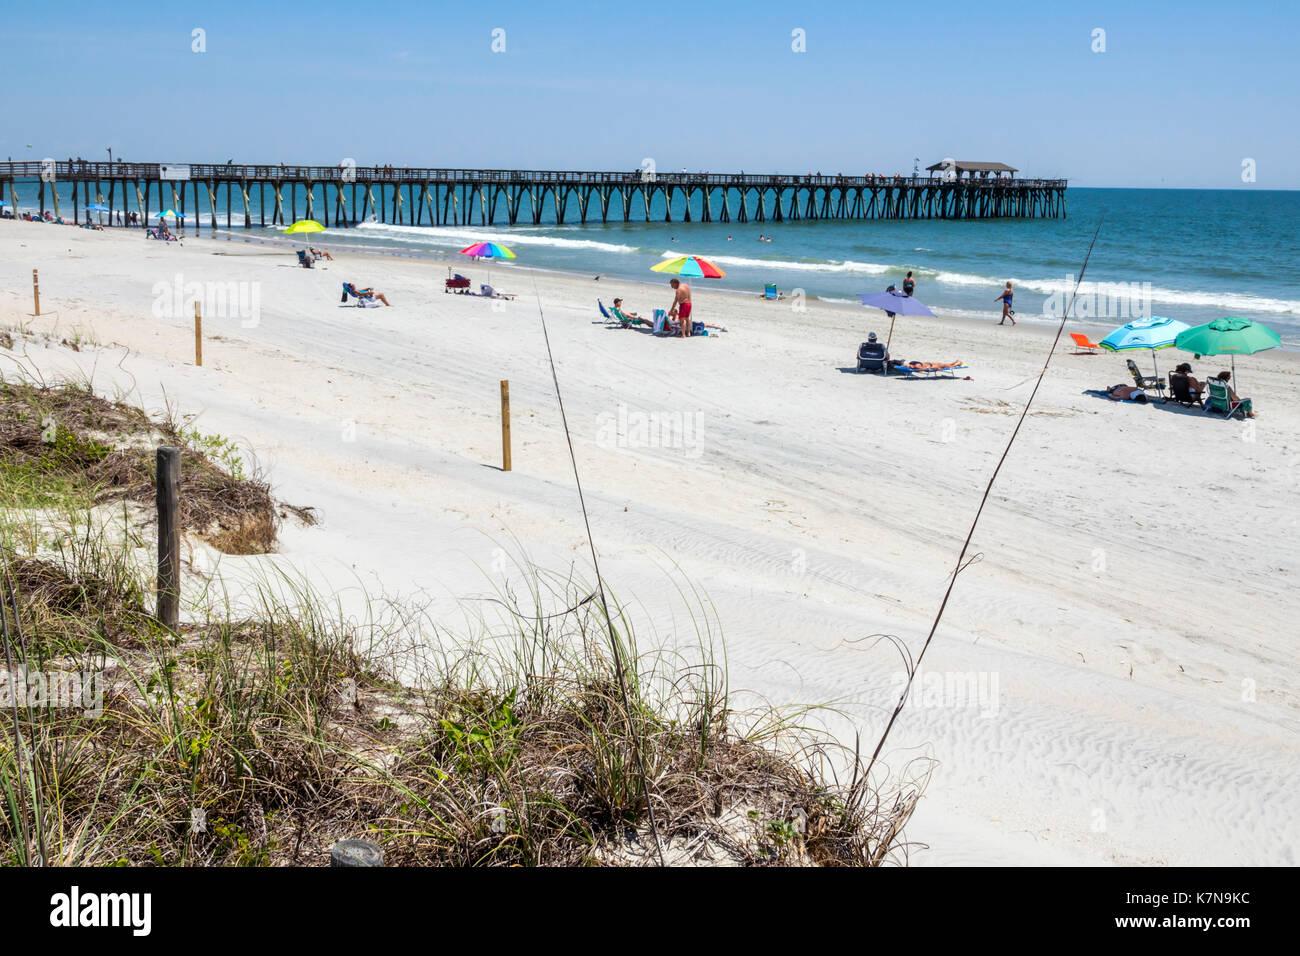 Myrtle Beach South Carolina SC Atlantic Ocean Myrtle Beach State Park sand fishing pier dune sunbathers - Stock Image